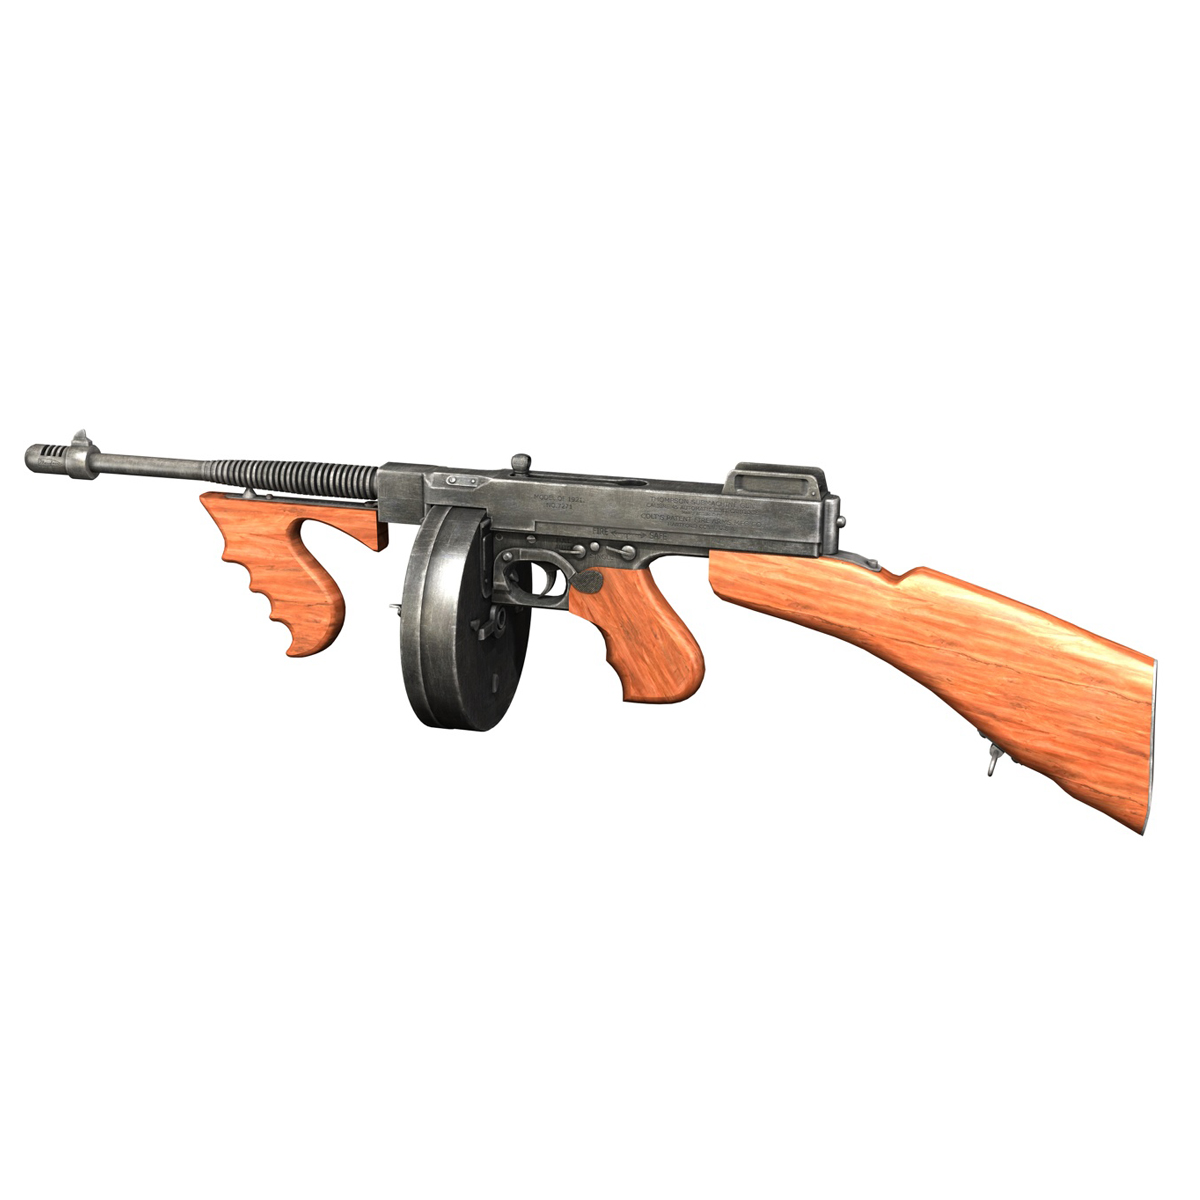 colt model1921 thompson submachine gun 3d model 3ds c4d lwo obj 264708